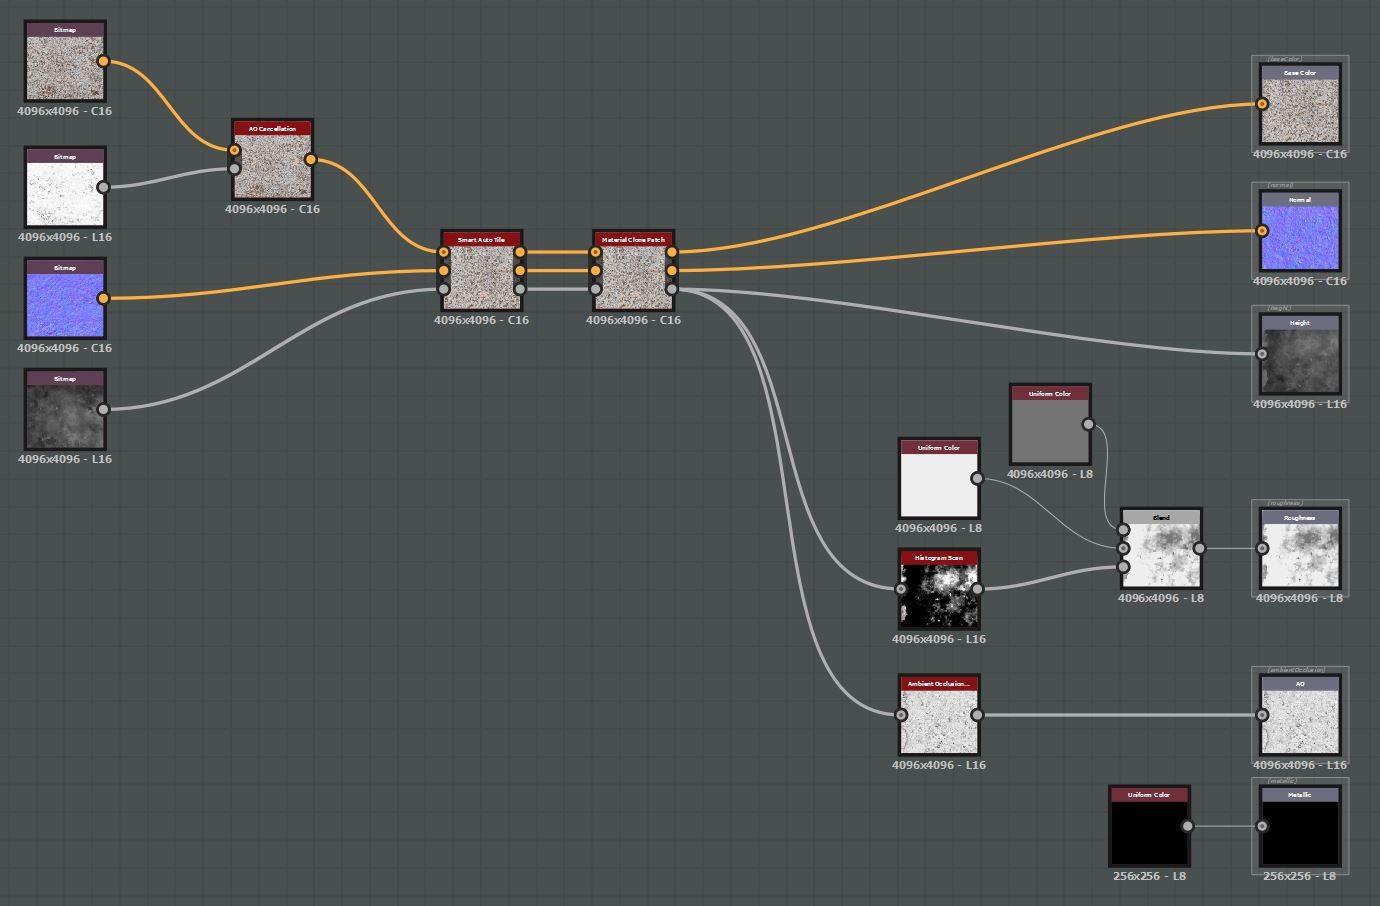 Dave riganelli nodes